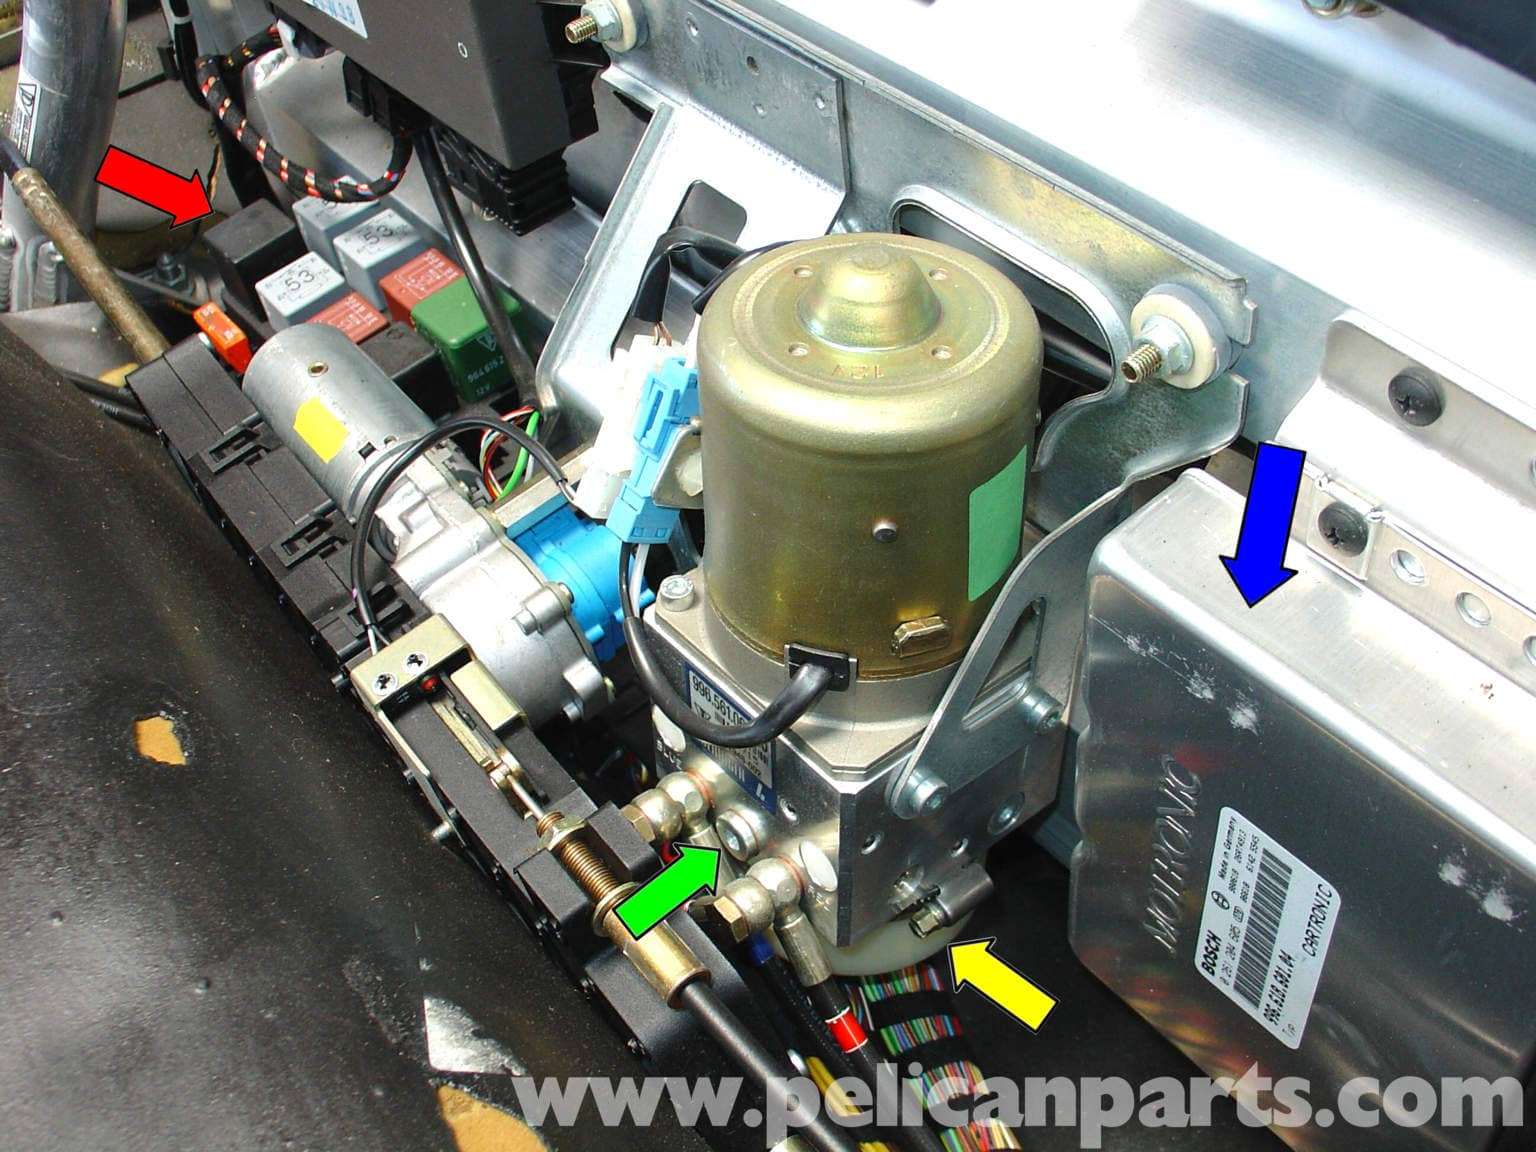 2004 Corvette Headlight Wiring Diagram Porsche 911 Carrera Convertible Top Mechanism Repair 996